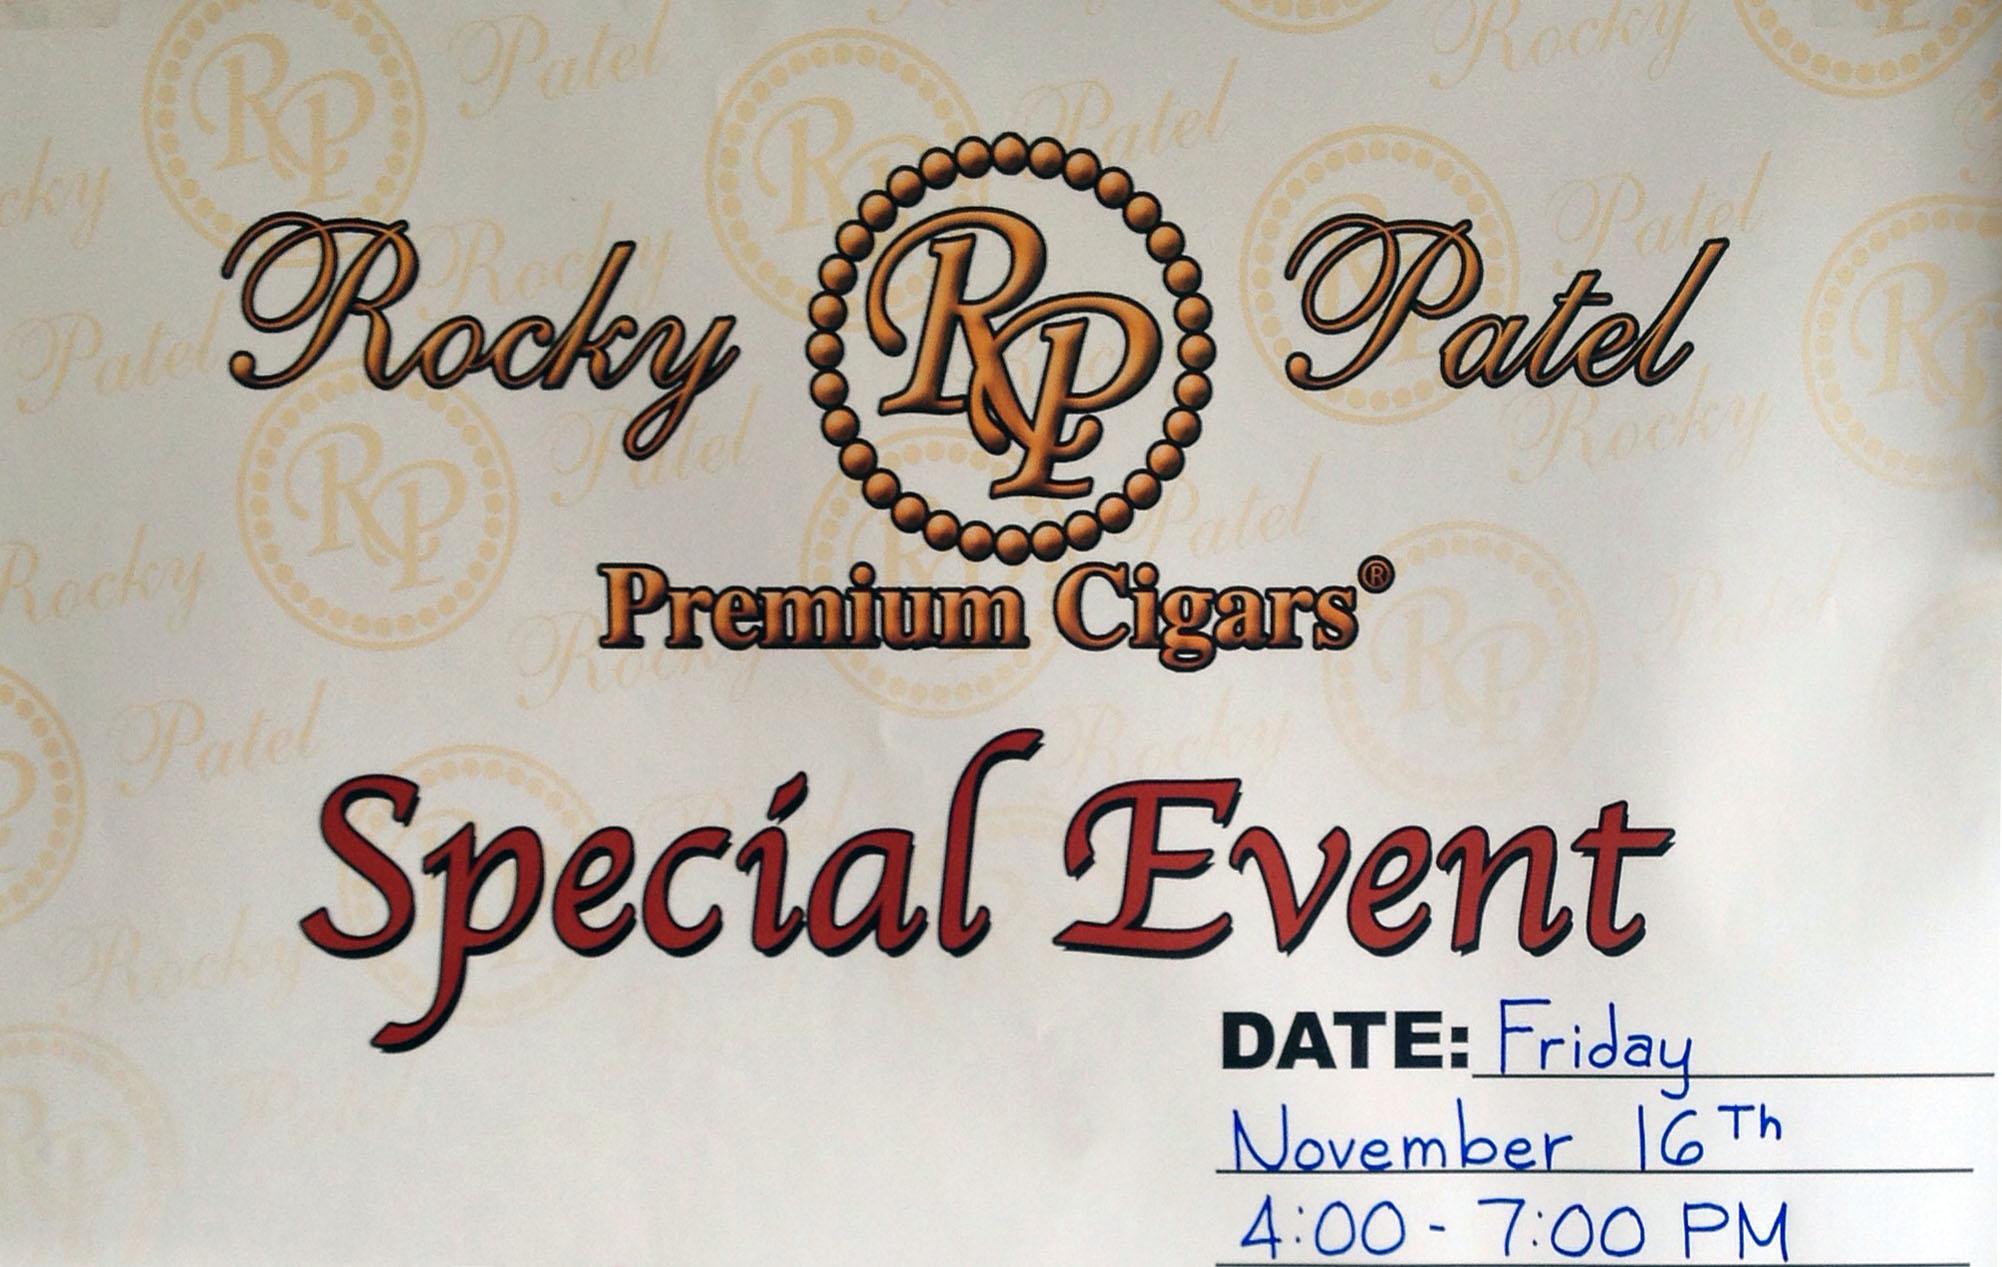 Rocky Patel Special Event, Nov 16 4-7pm